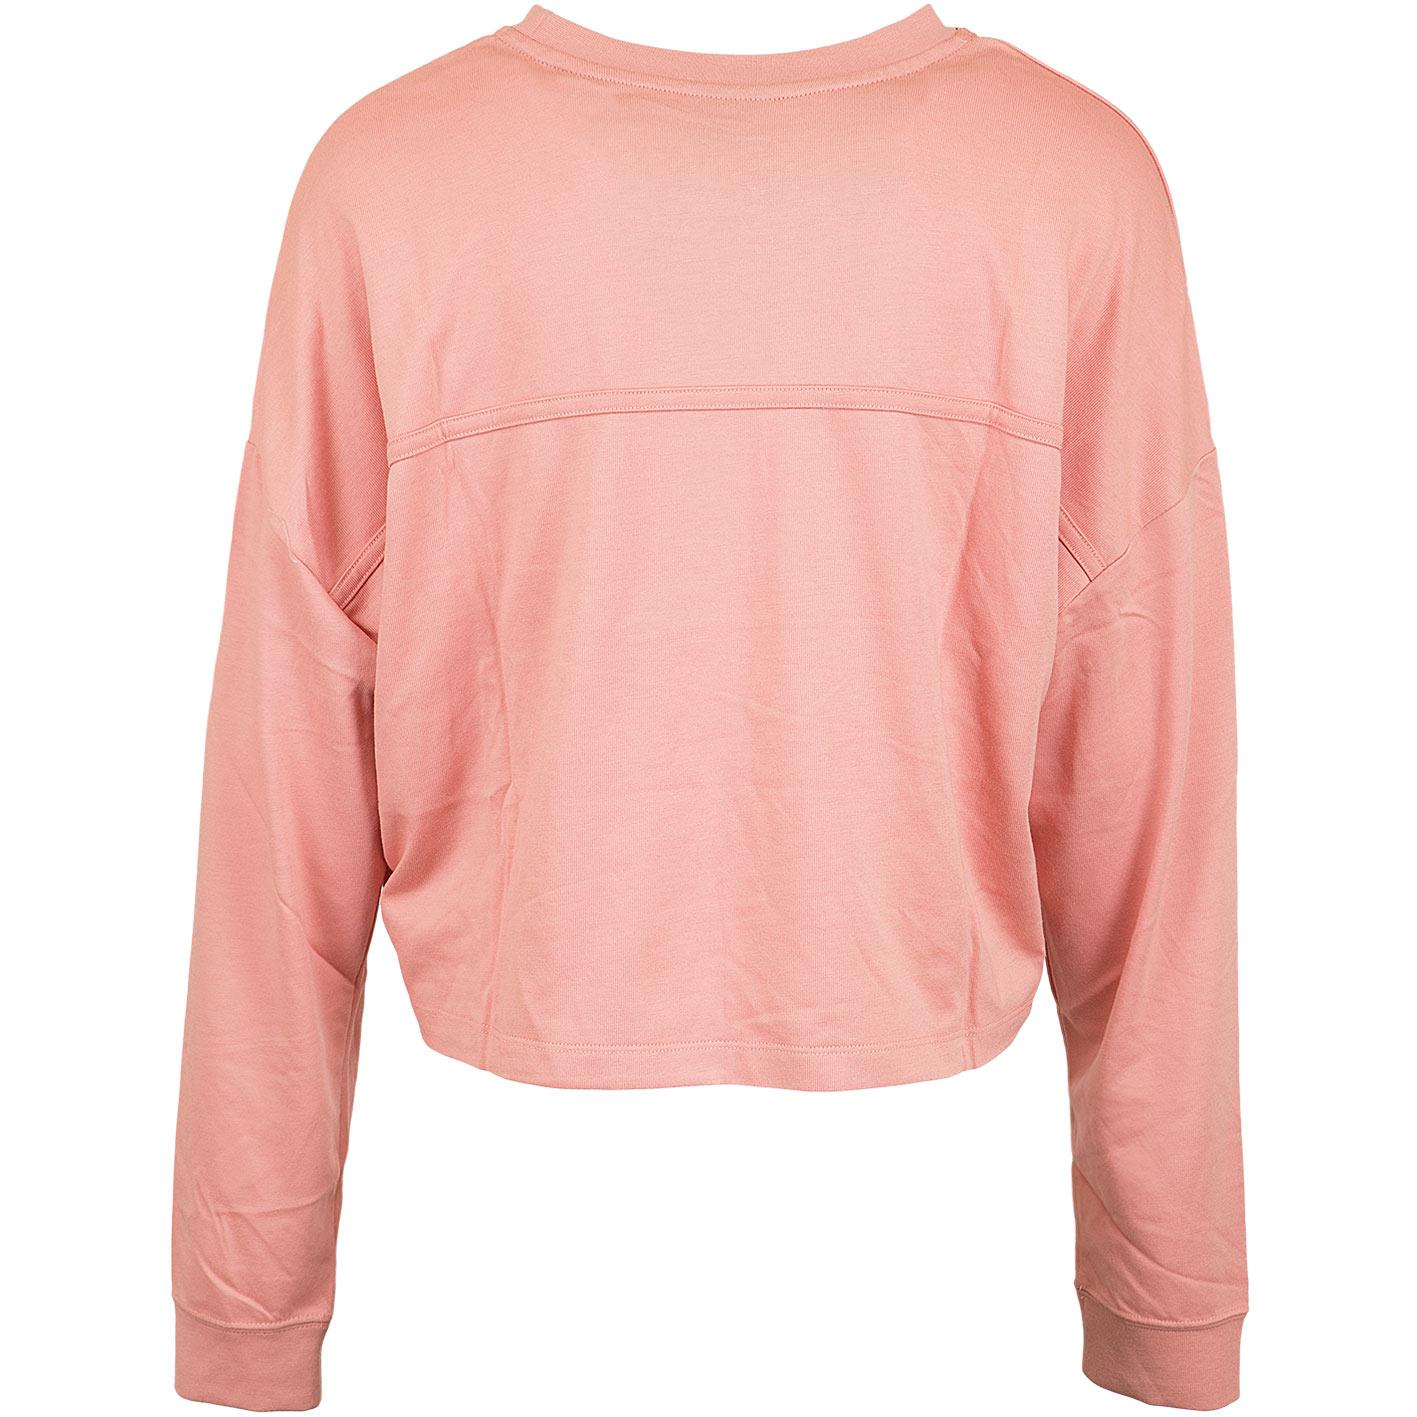 quality design 9f8ed 696b6 Nike Damen Sweatshirt Jersey rosa